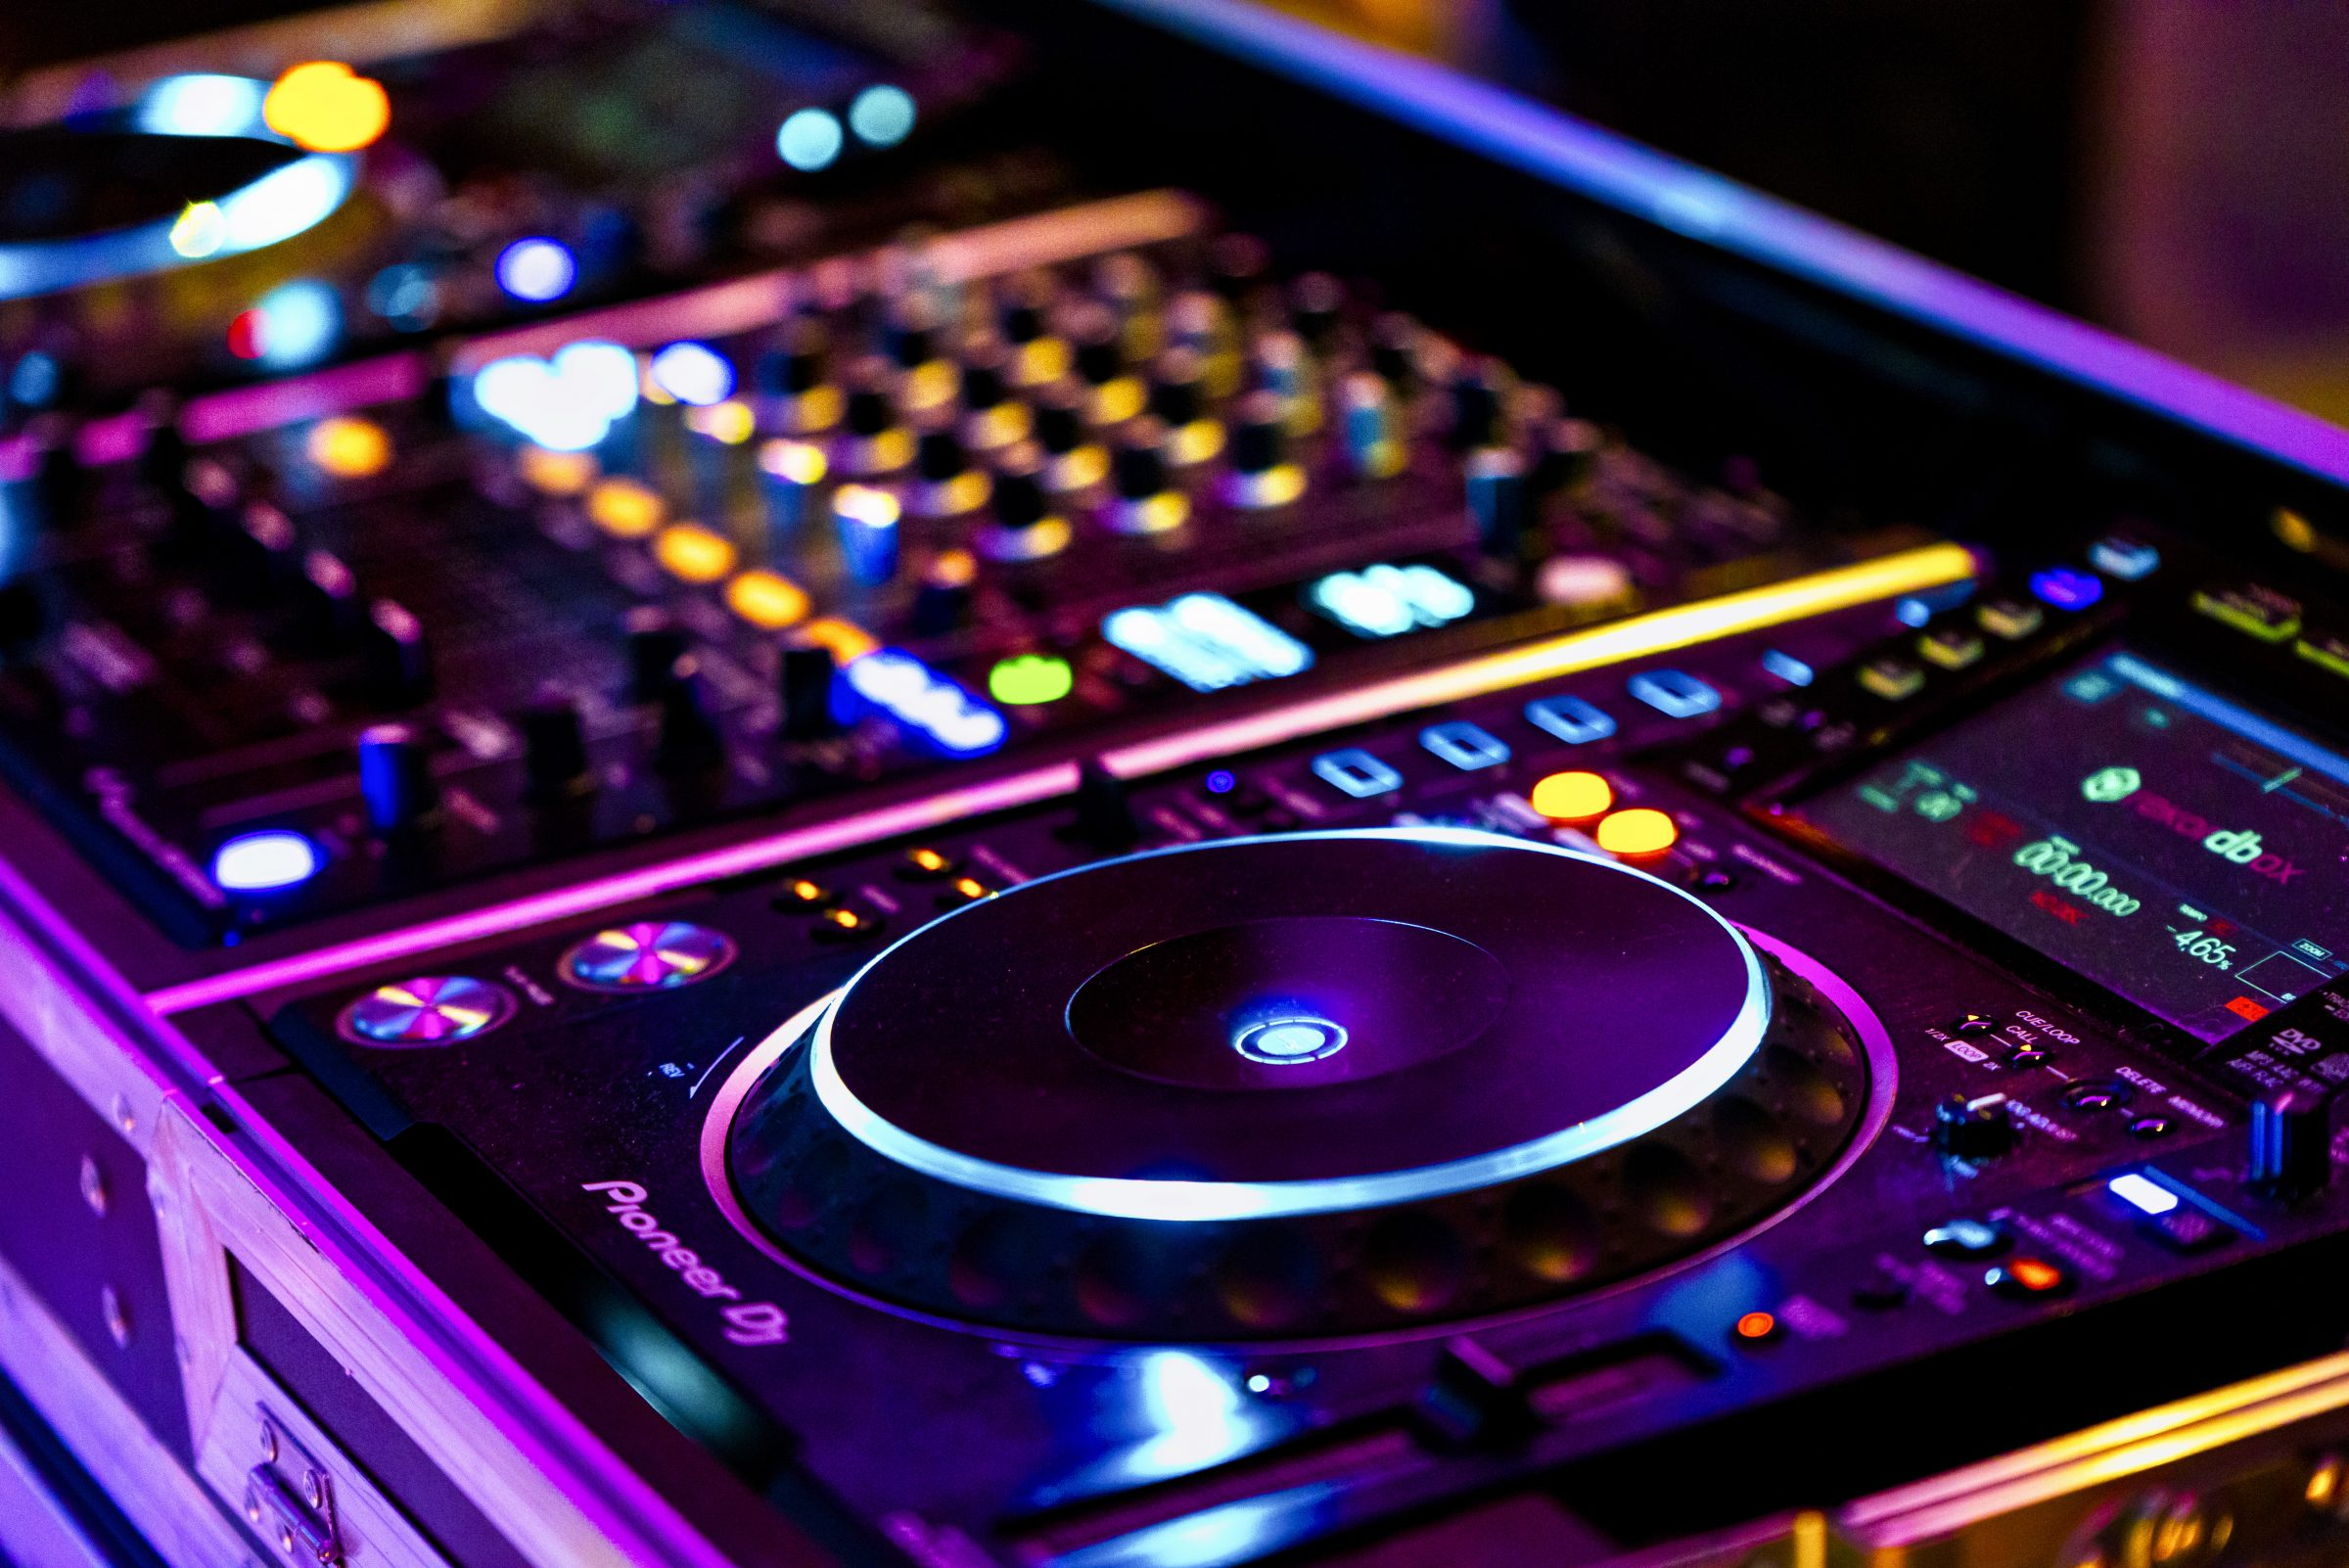 Bølgen & Moi fest DJ